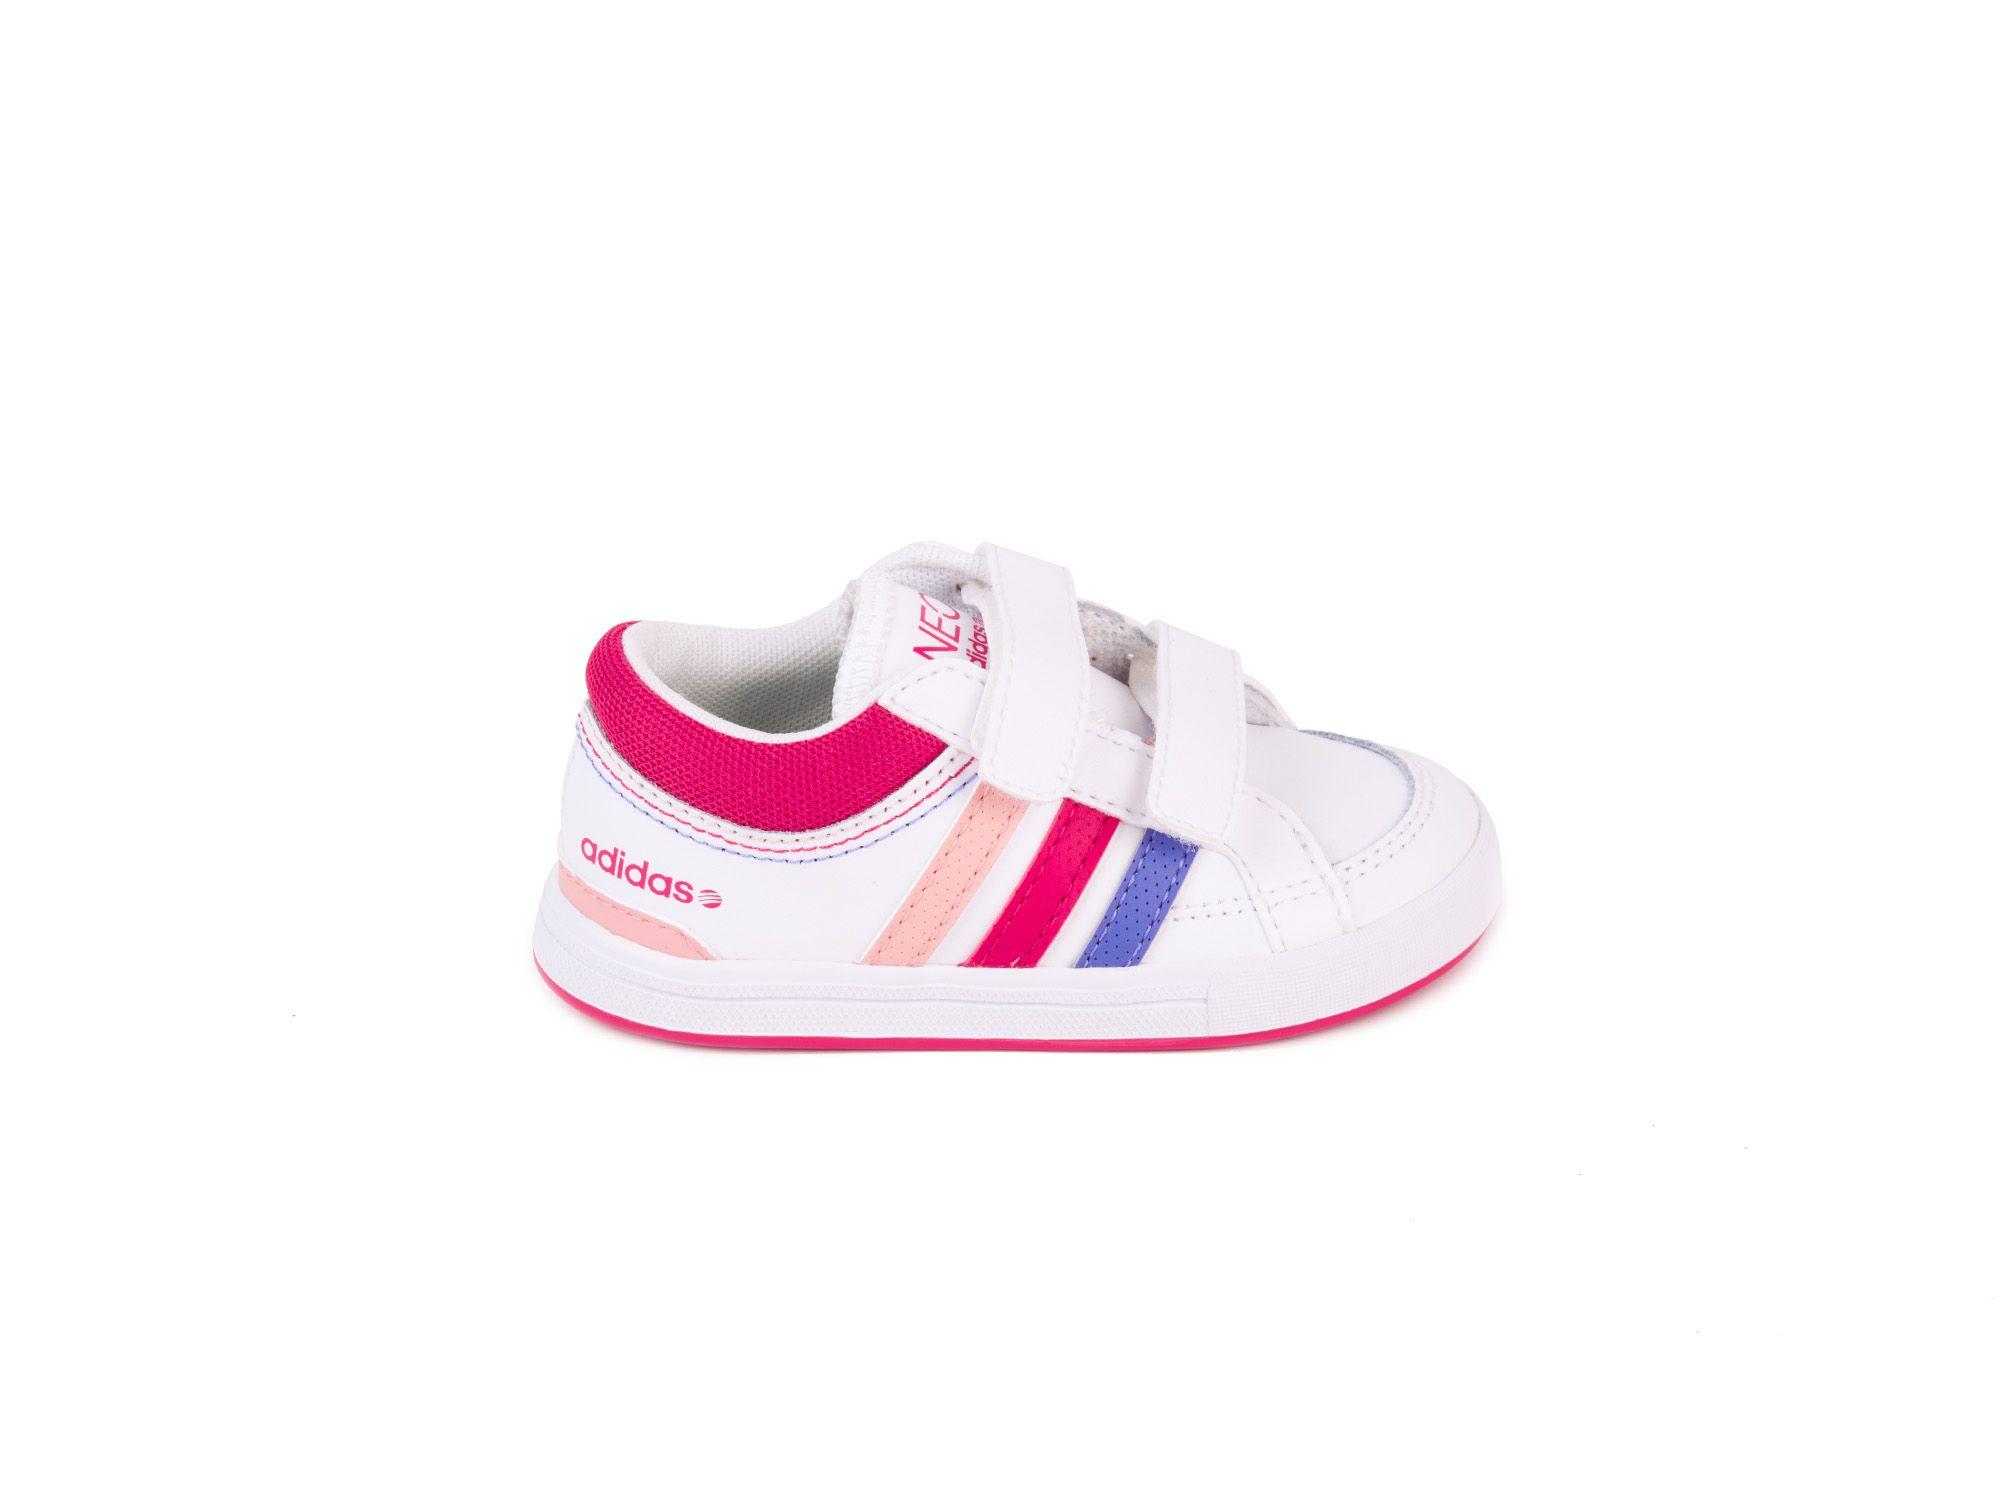 Adidas Neo Bbneo Skool Lo M